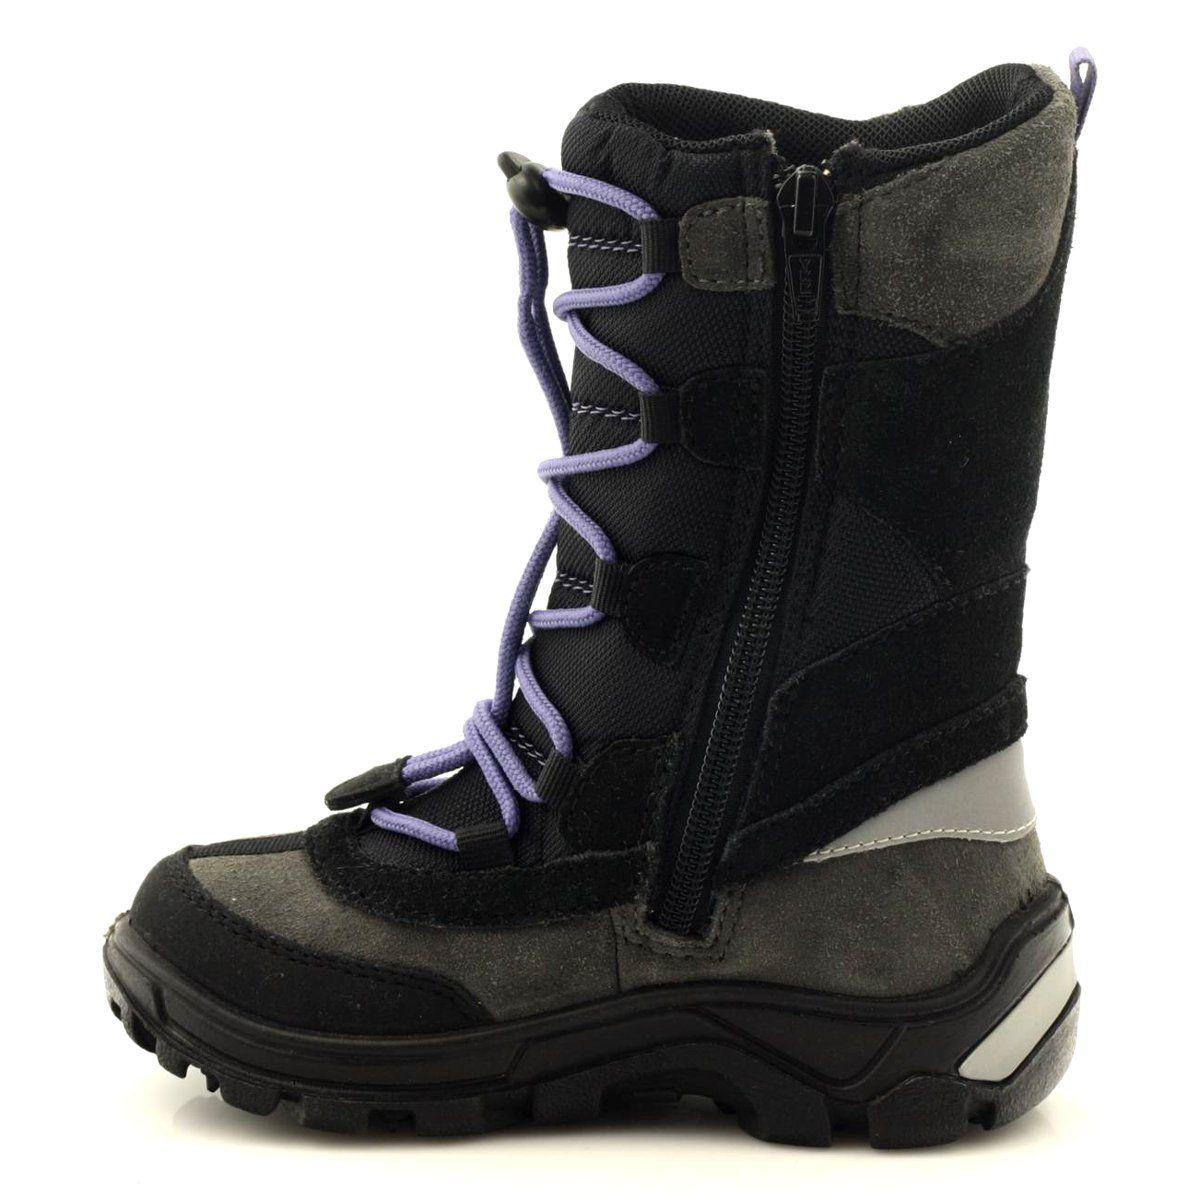 Kozaczki Z Membrana Bartek 34252 Szare Fioletowe Czarne Combat Boots Army Boot Boots